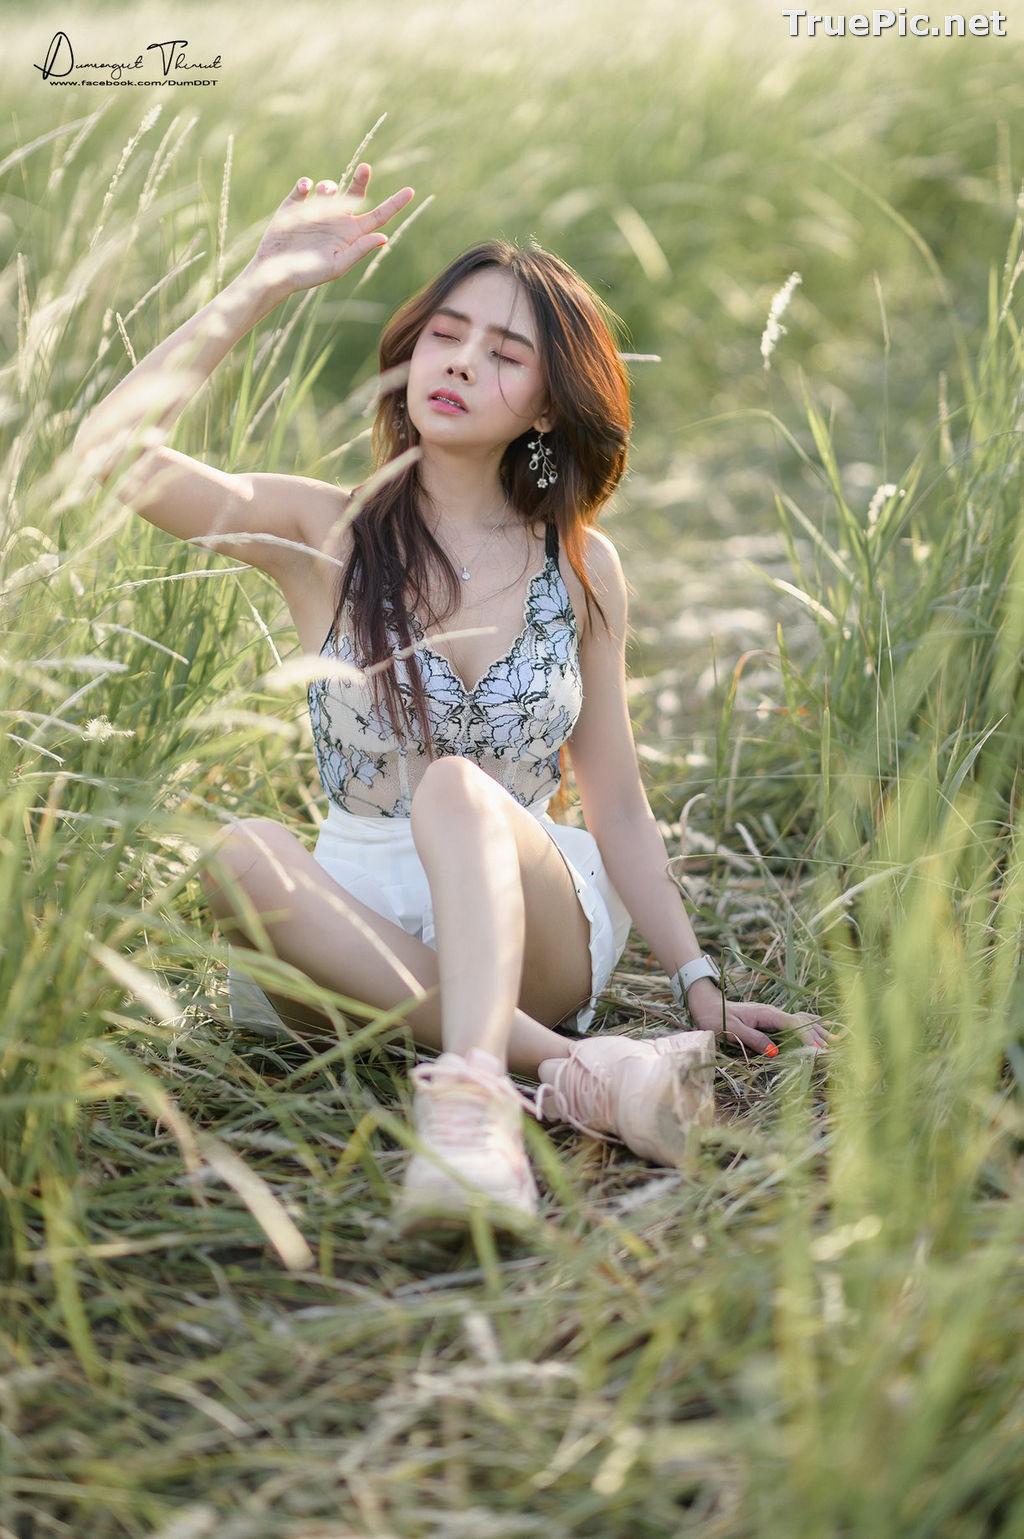 Image Thailand Model - Anusara Thaweesuk - Wild Grass Field - TruePic.net - Picture-6